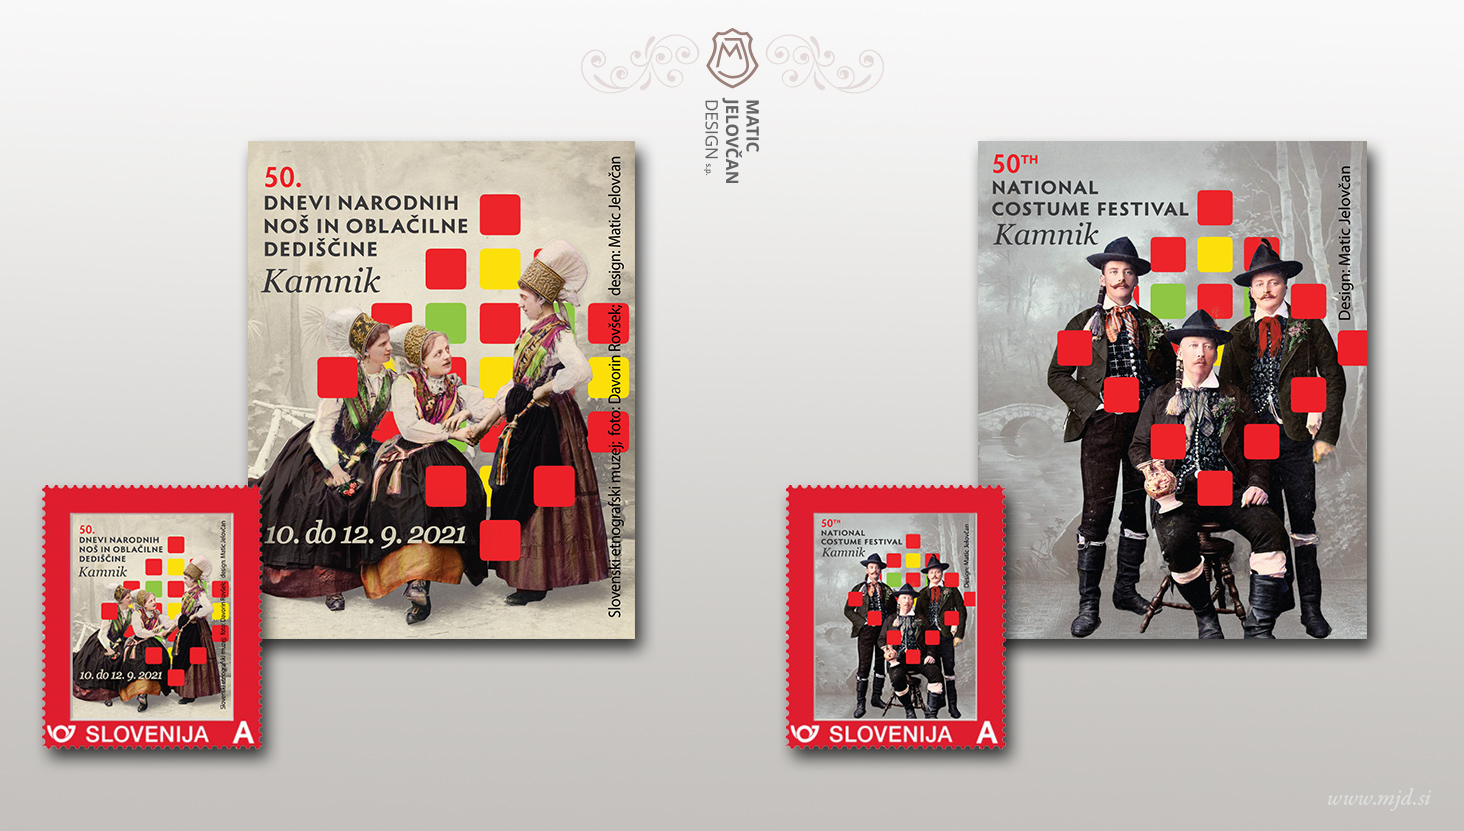 znamke - Designing stamps, envelope and a seal